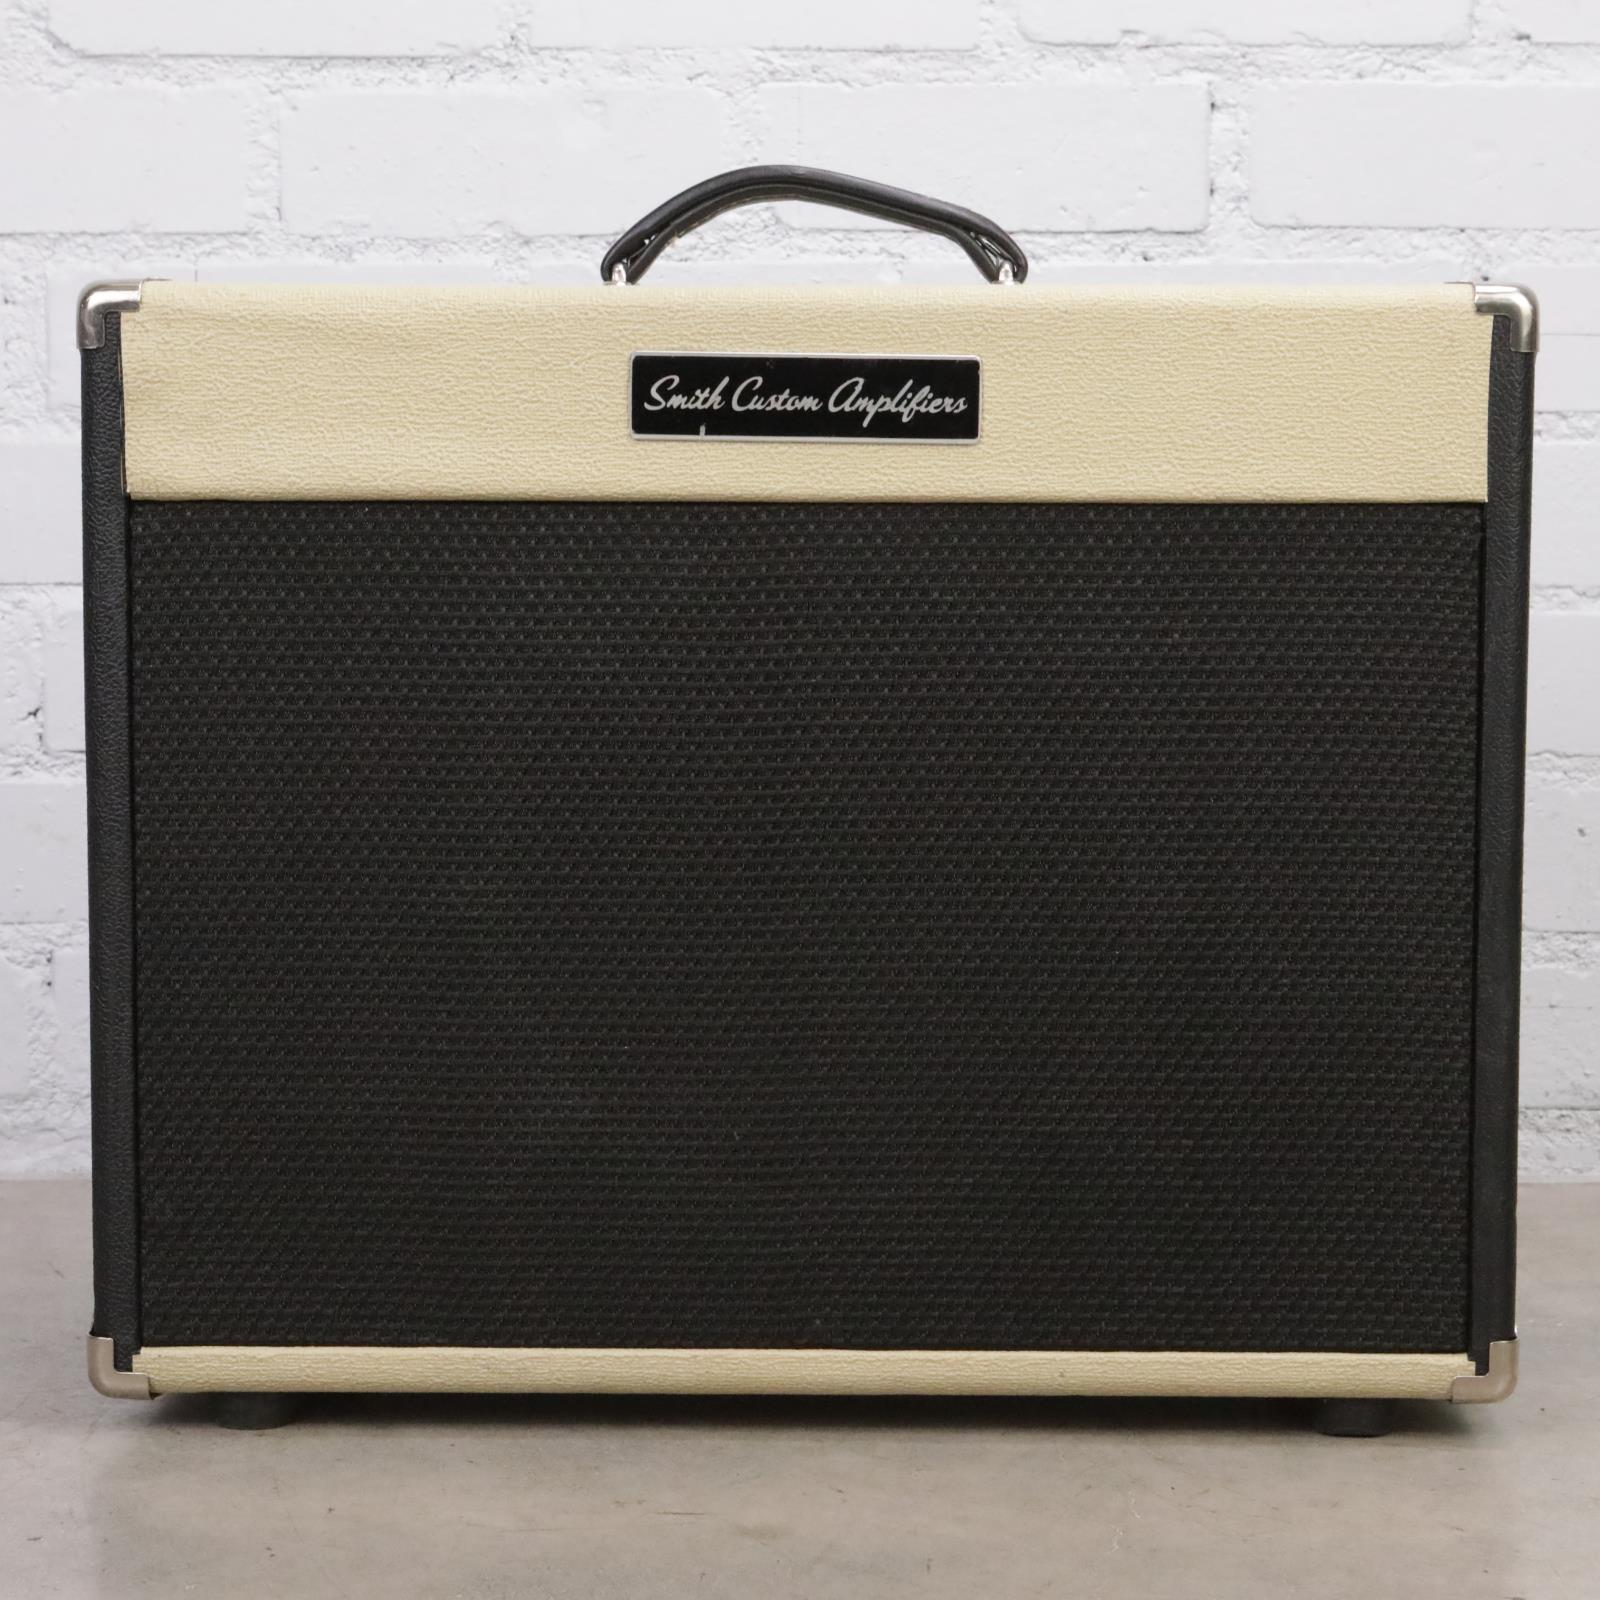 Smith Custom Amplifiers CS25R 1x12 Tube Guitar Amplifier Combo Boutique #44412